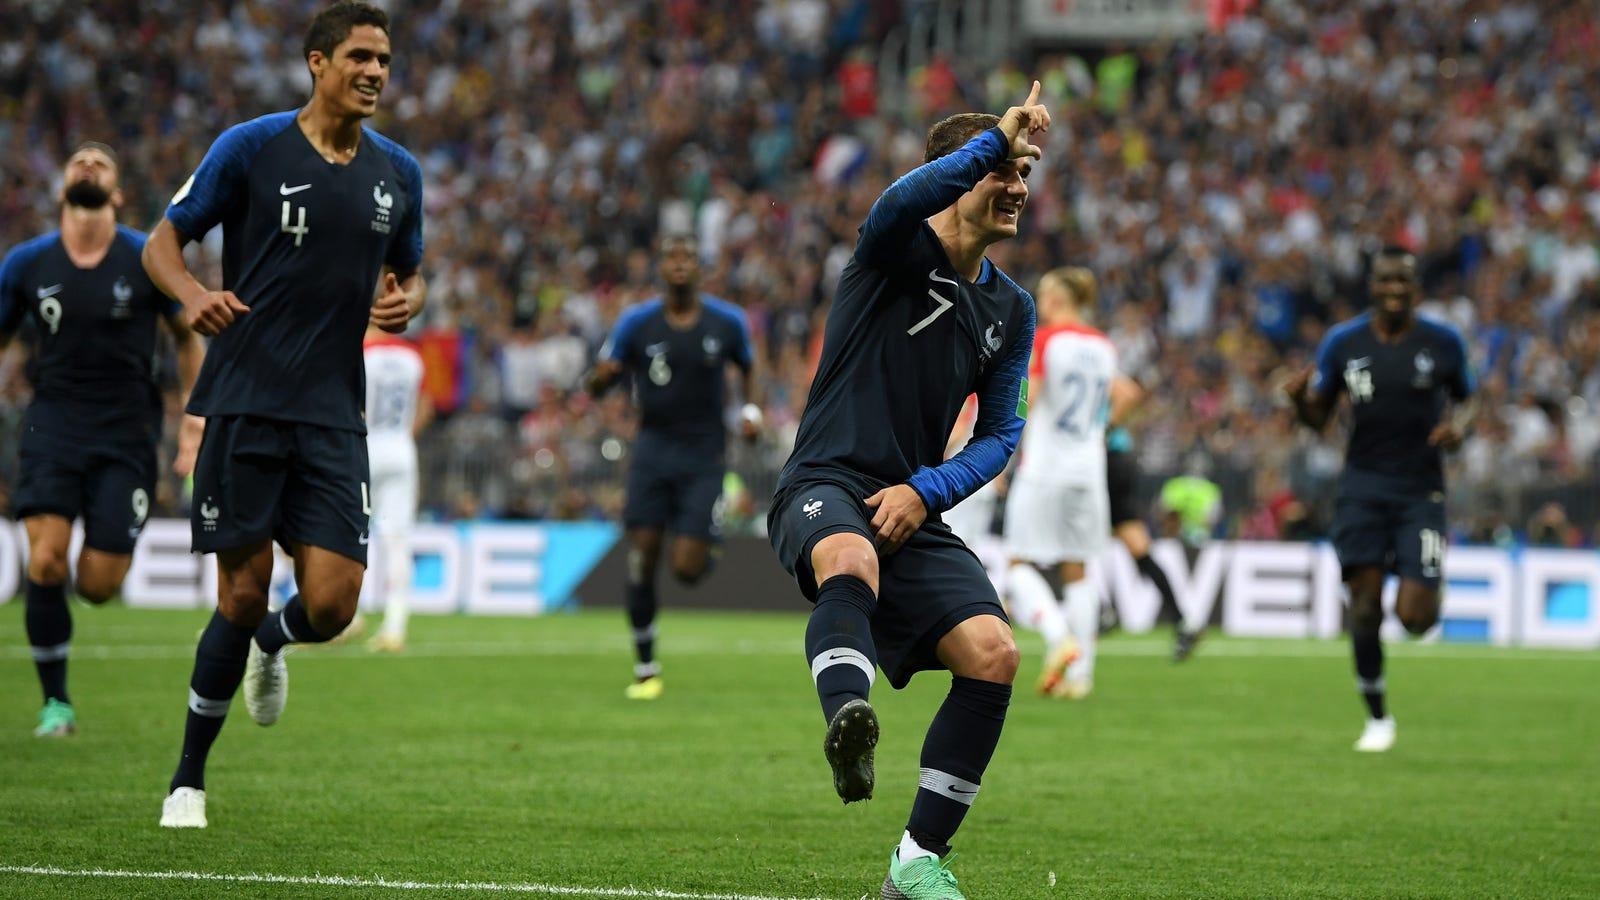 World Cup Player Celebrates Goal With RudeFortnite Emote